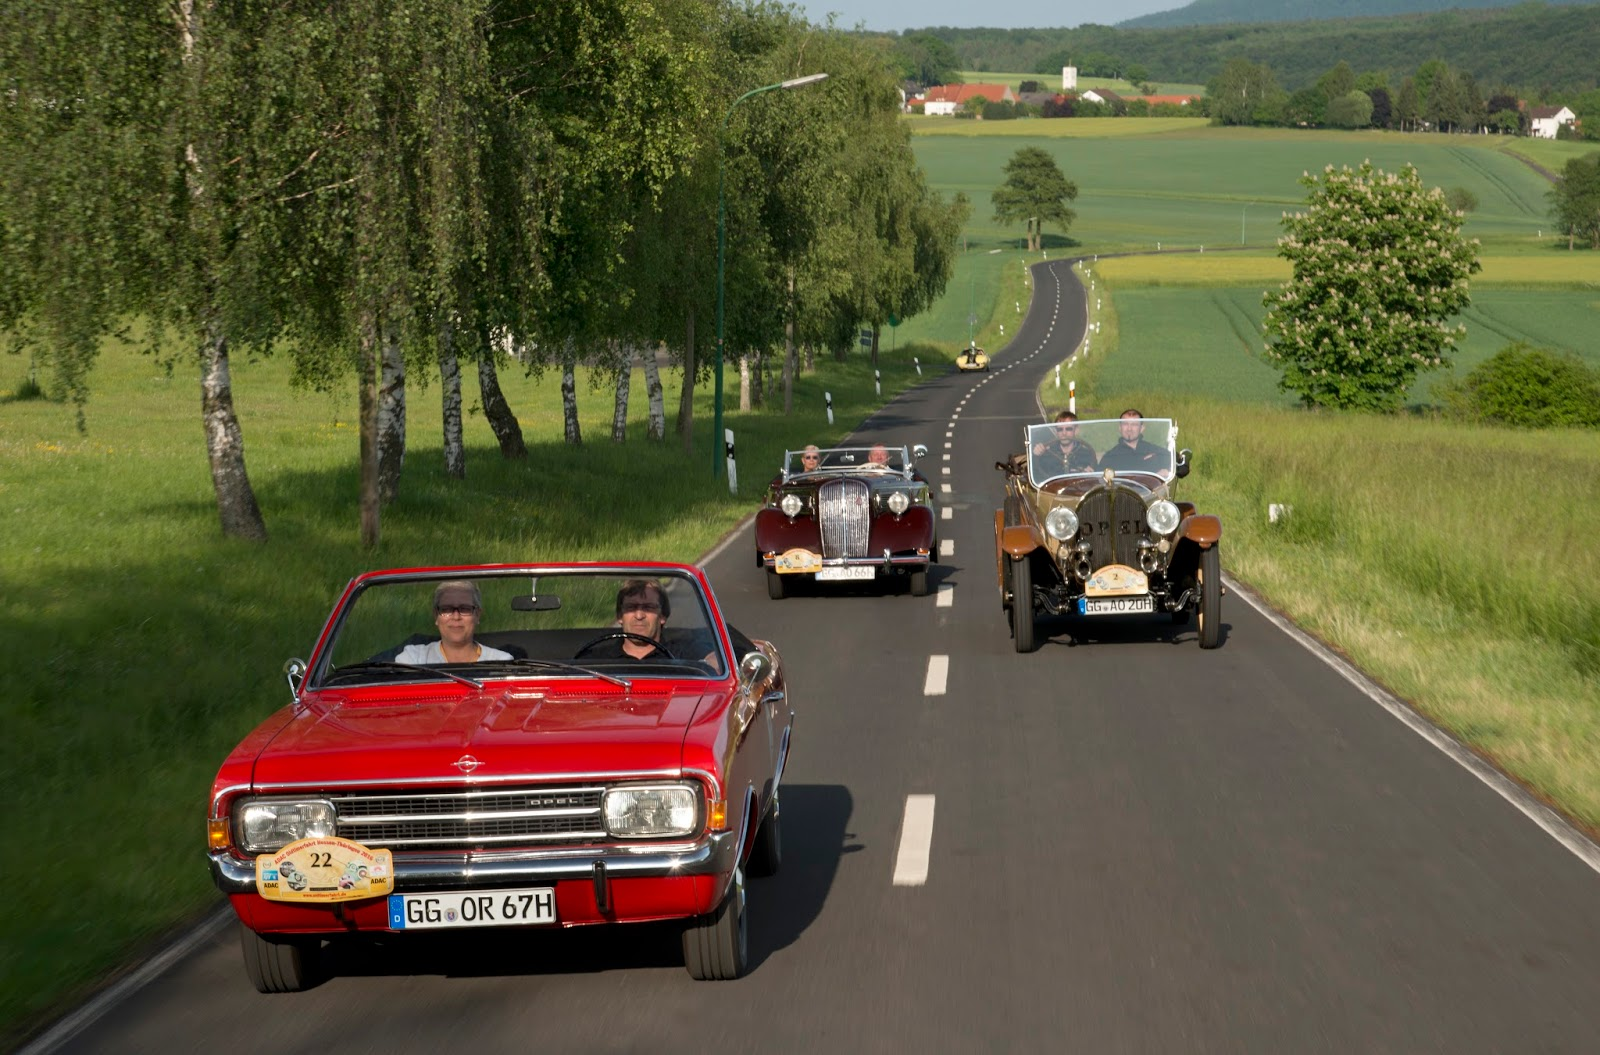 Opel Rallye Hessen Thueringen 2016 301180 Ταξίδι στο χρόνο μέσα από την ιστορία 100 χρόνων των Opel Cabrio cabrio, Opel, Opel 8/25 hp, Opel Cascada, Opel Olympia, Opel Record